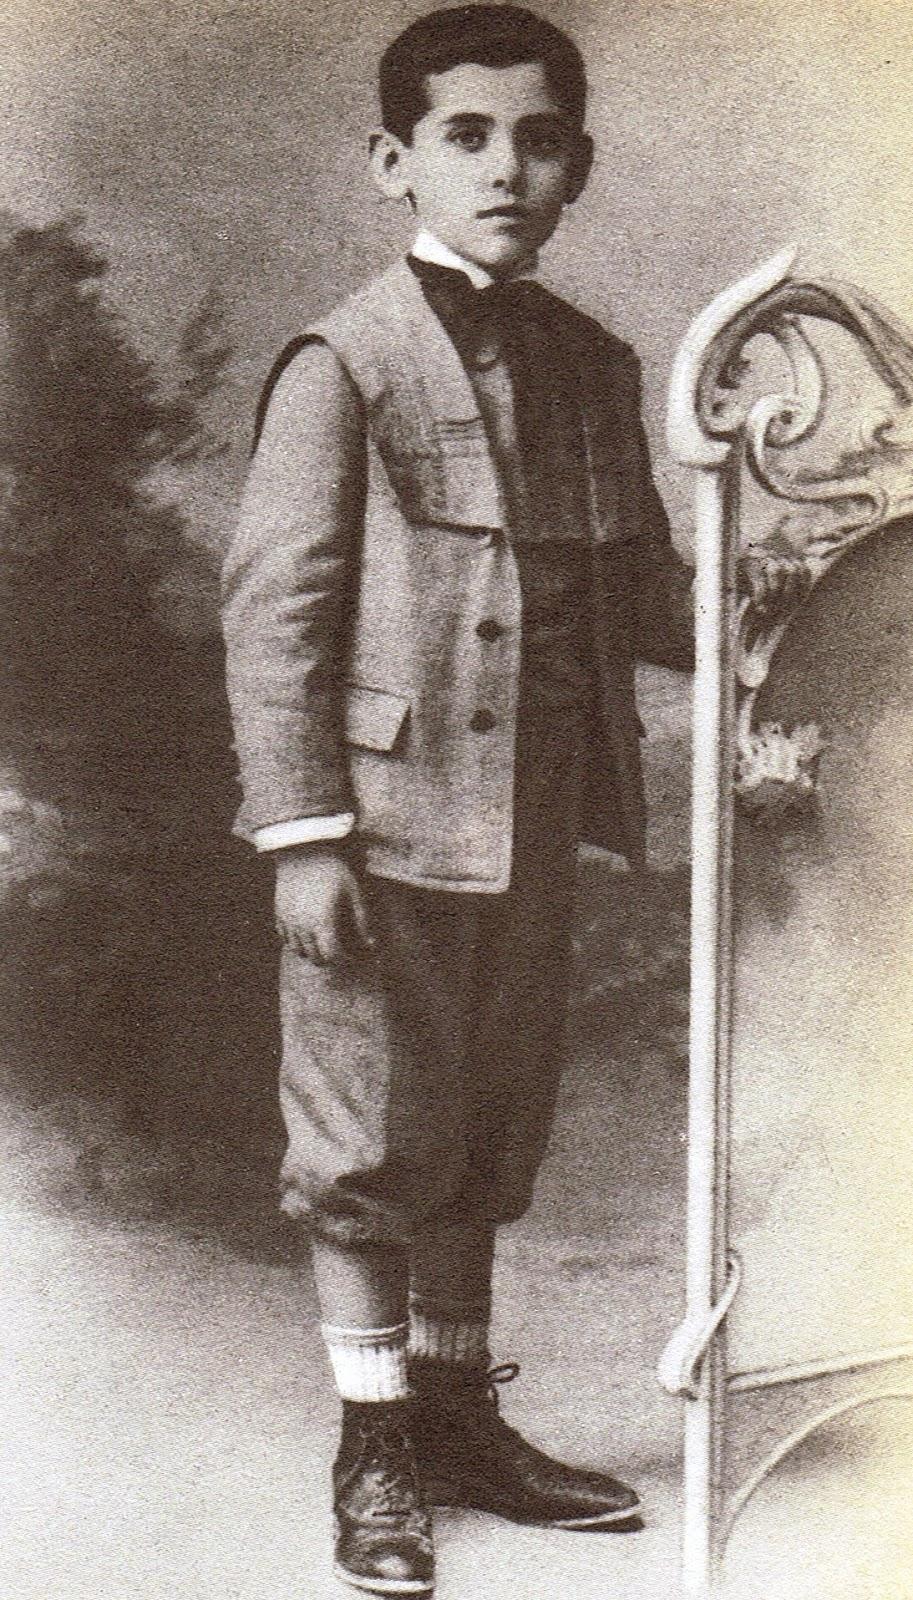 Lorca con seis años